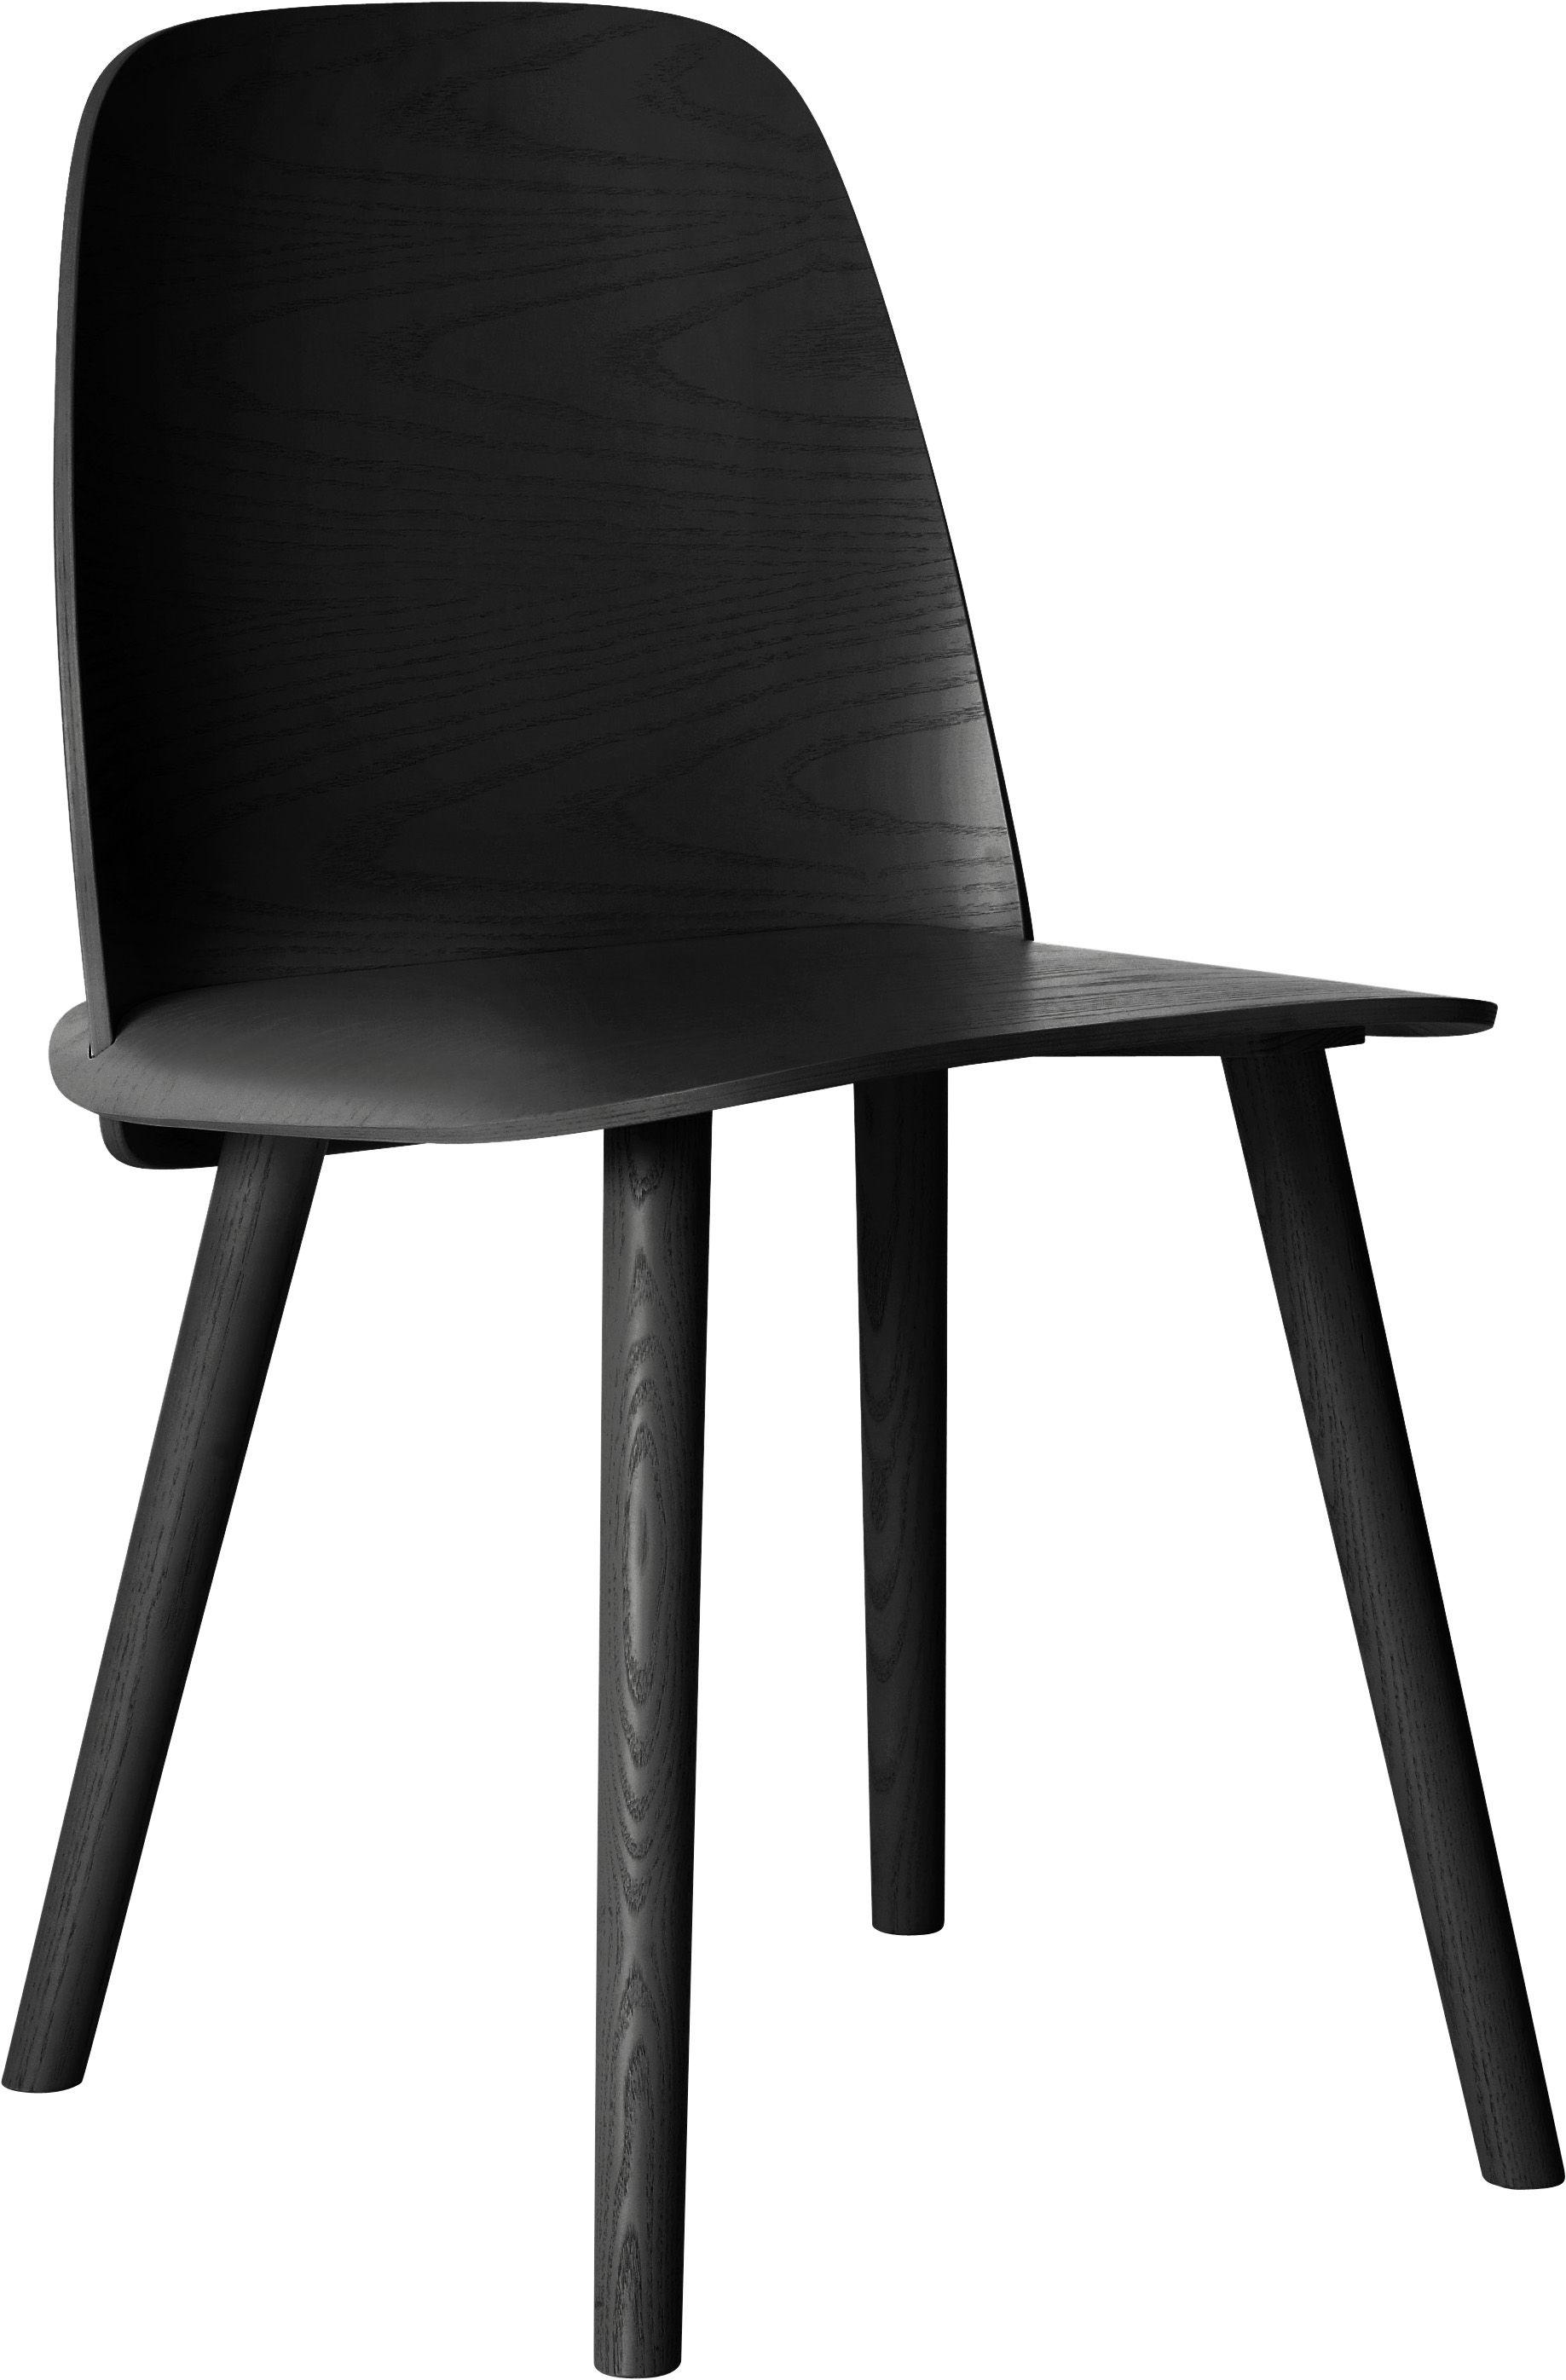 chaise nerd bois noir muuto. Black Bedroom Furniture Sets. Home Design Ideas